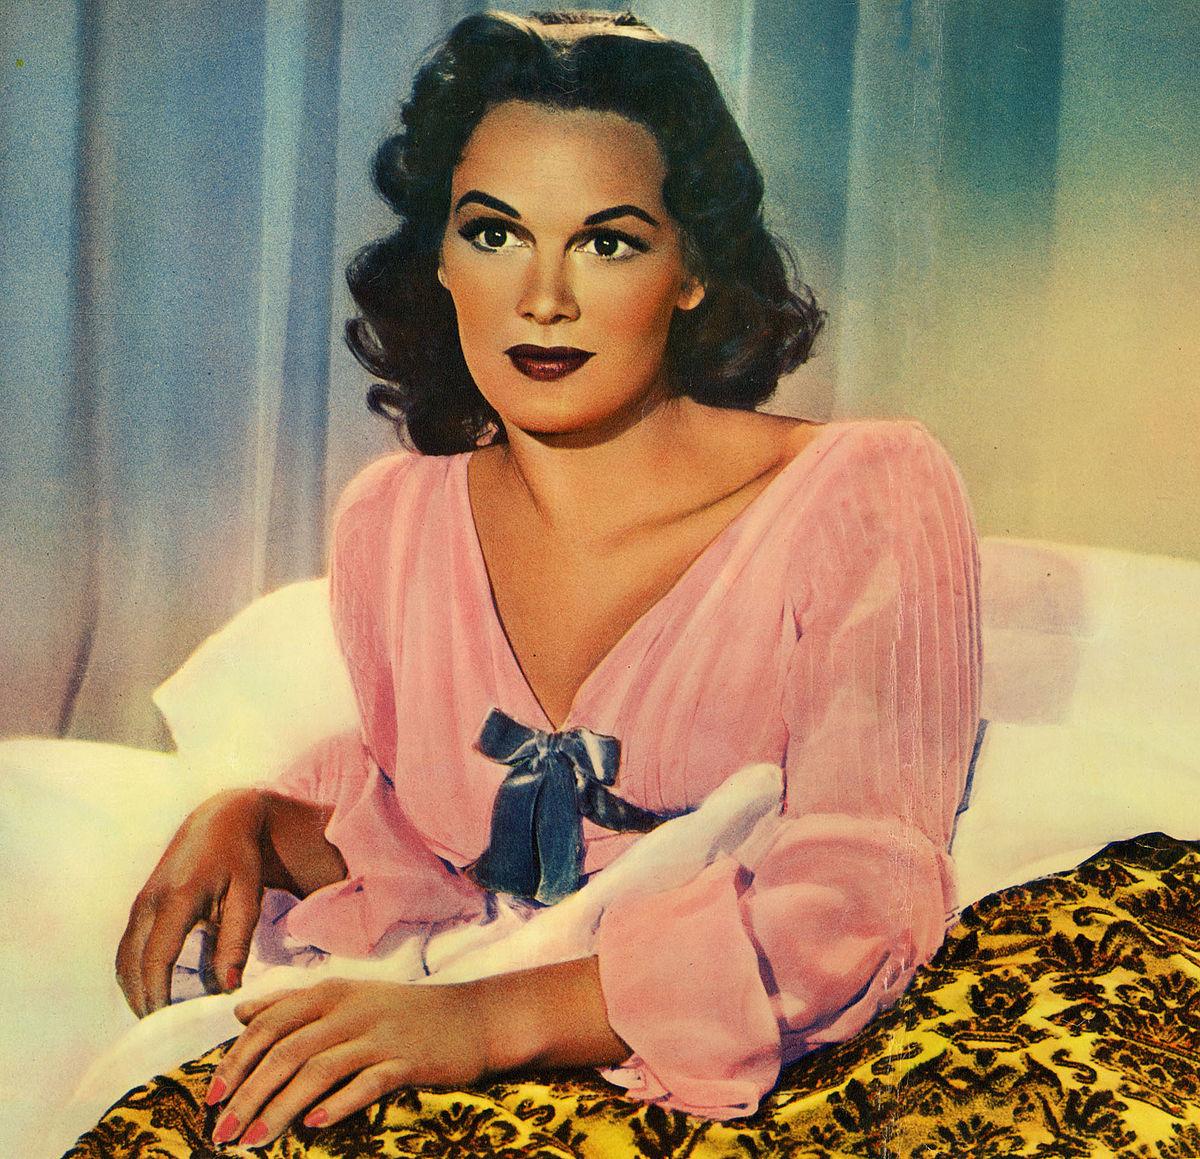 Jane Bryan,Kareena Kapoor Erotic image Lillian Randolph,Coca Crystal